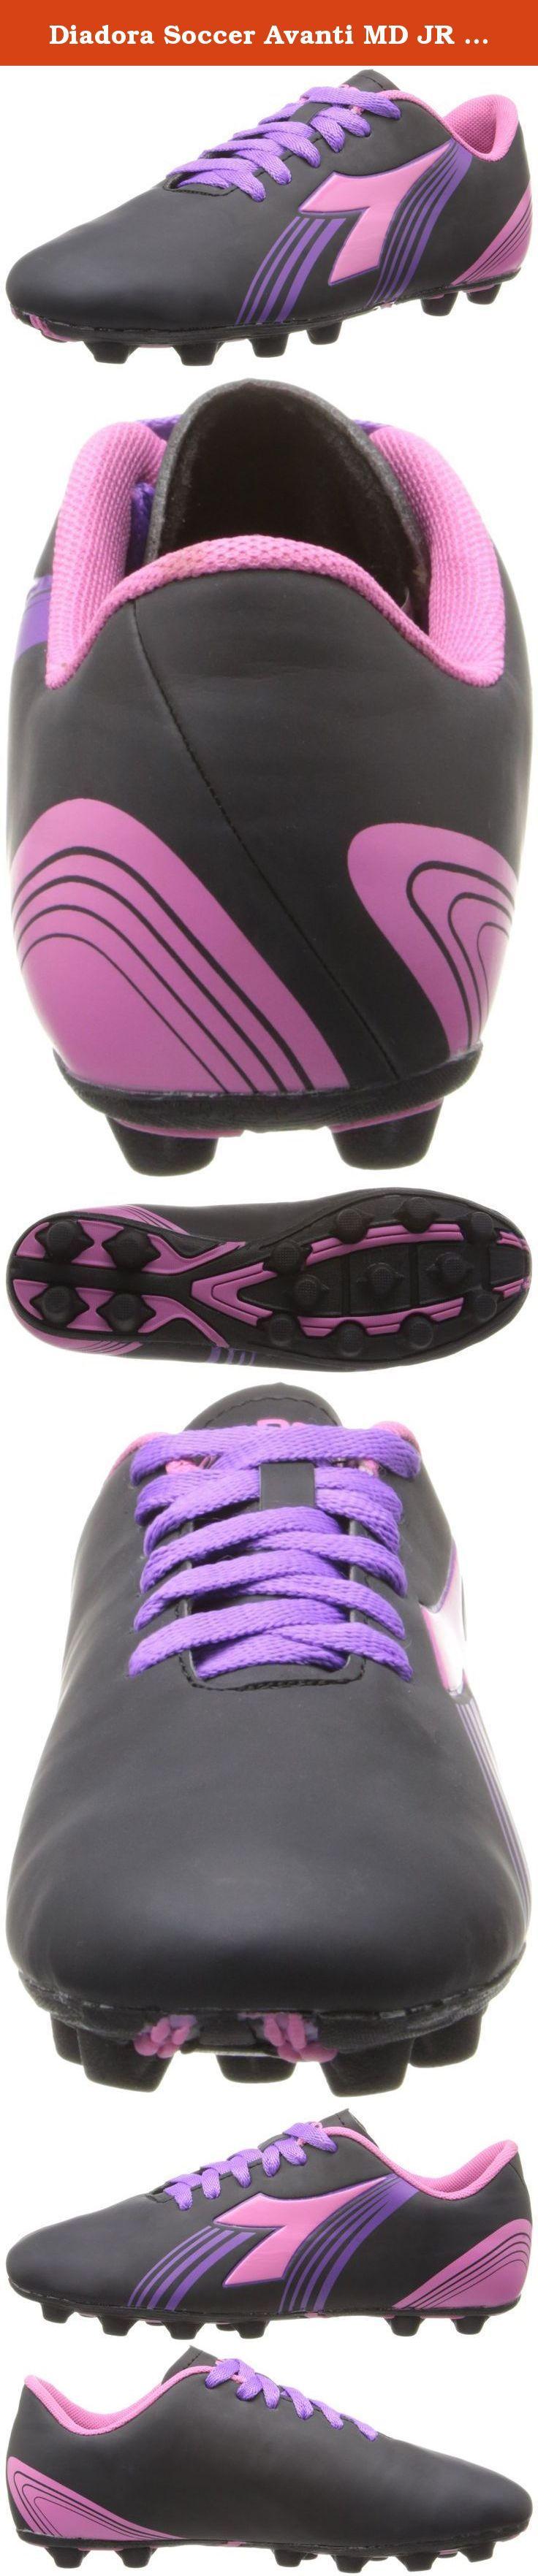 Diadora Soccer Avanti MD JR Soccer Shoe (Toddler/Little Kid/Big Kid),Black/Pink/Purple,8 M US Toddler. Dimensions: 4.5 Yth Sport: Field Hockey Sport: Lacrosse Sport: Soccer Width: Medium.